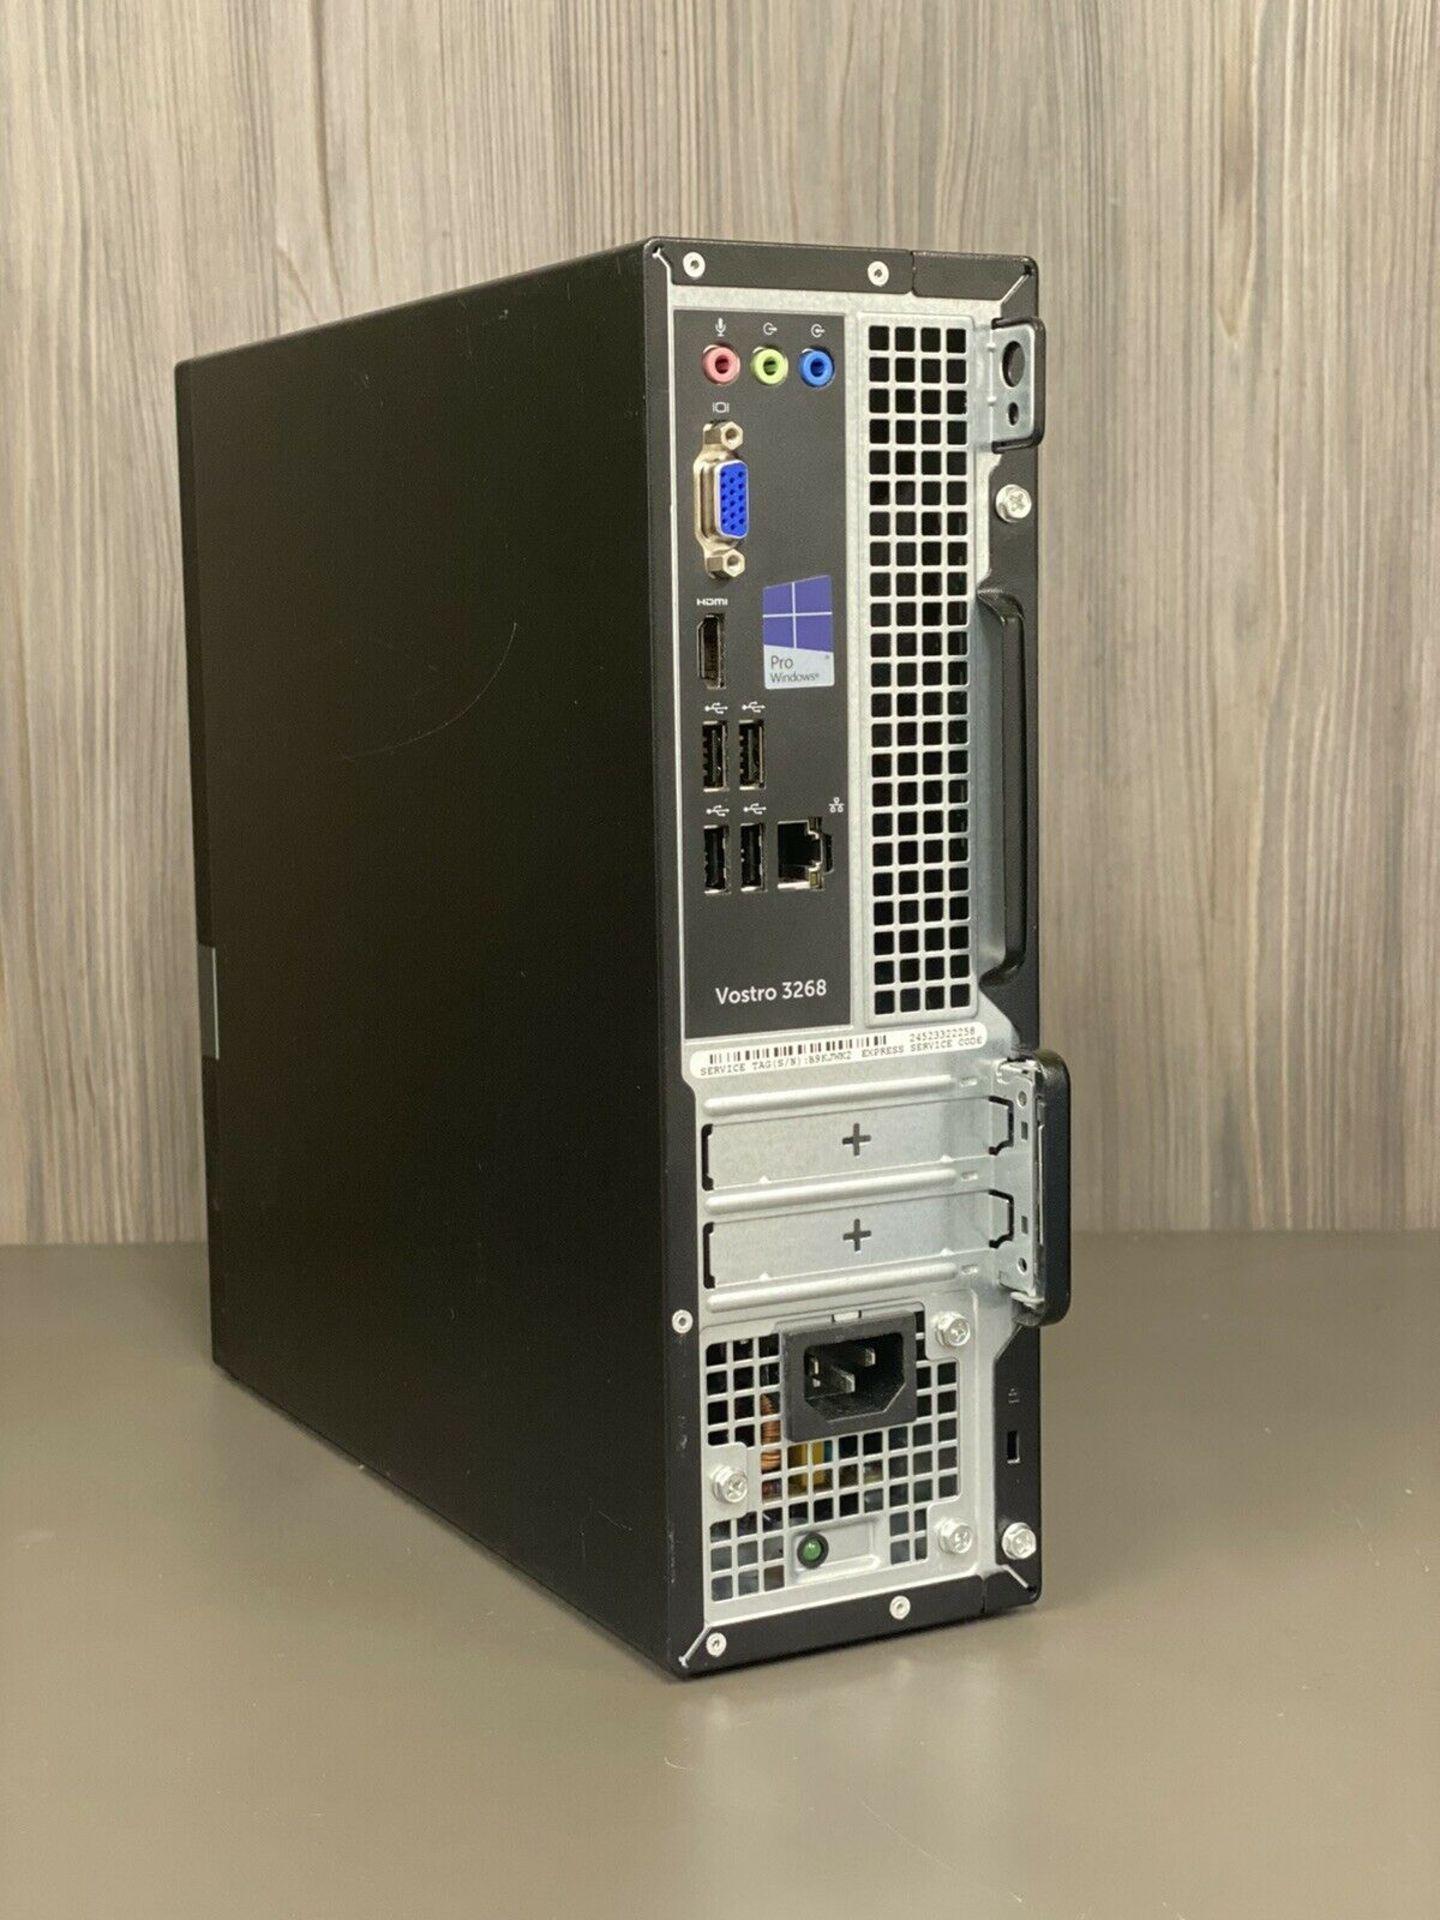 DELL VOSTRO 3268 PC INTEL I3 7TH GEN 7100 3.9GHz 4GB RAM 1TB HDD WINDOWS 10 *PLUS VAT* - Image 2 of 2